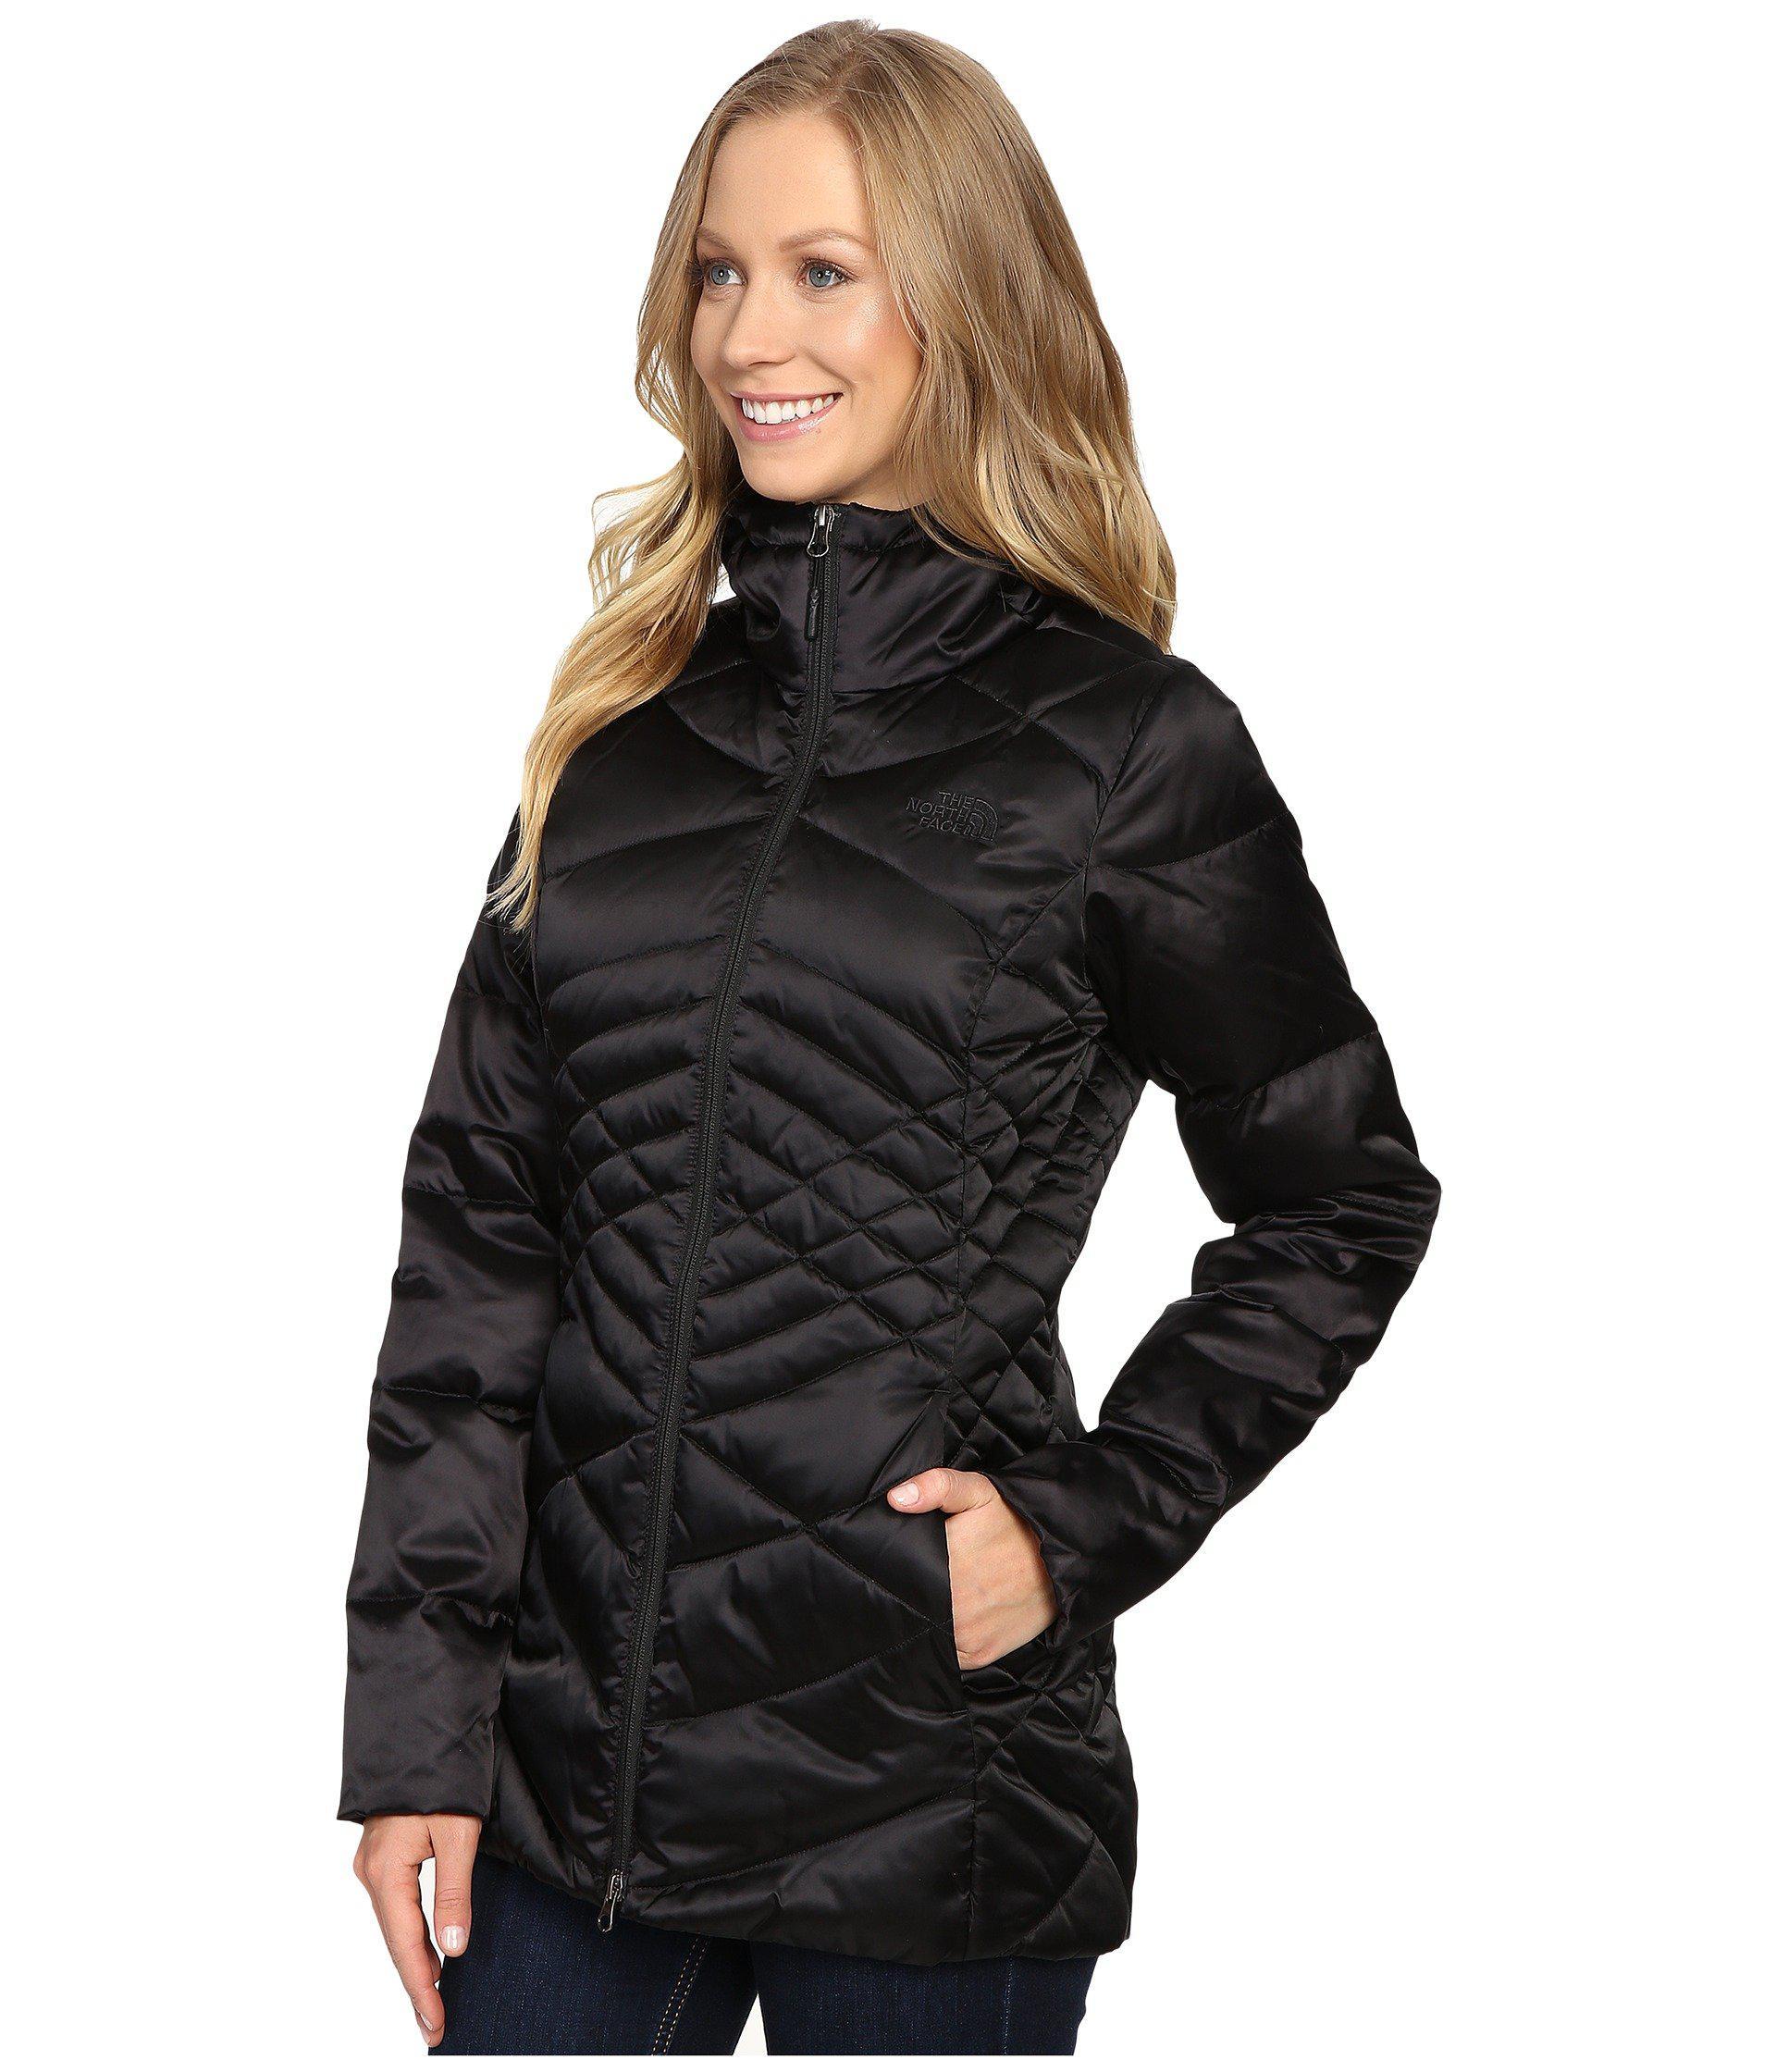 035a1b5501 Lyst - The North Face Aconcagua Parka (asphalt Grey) Women s Coat